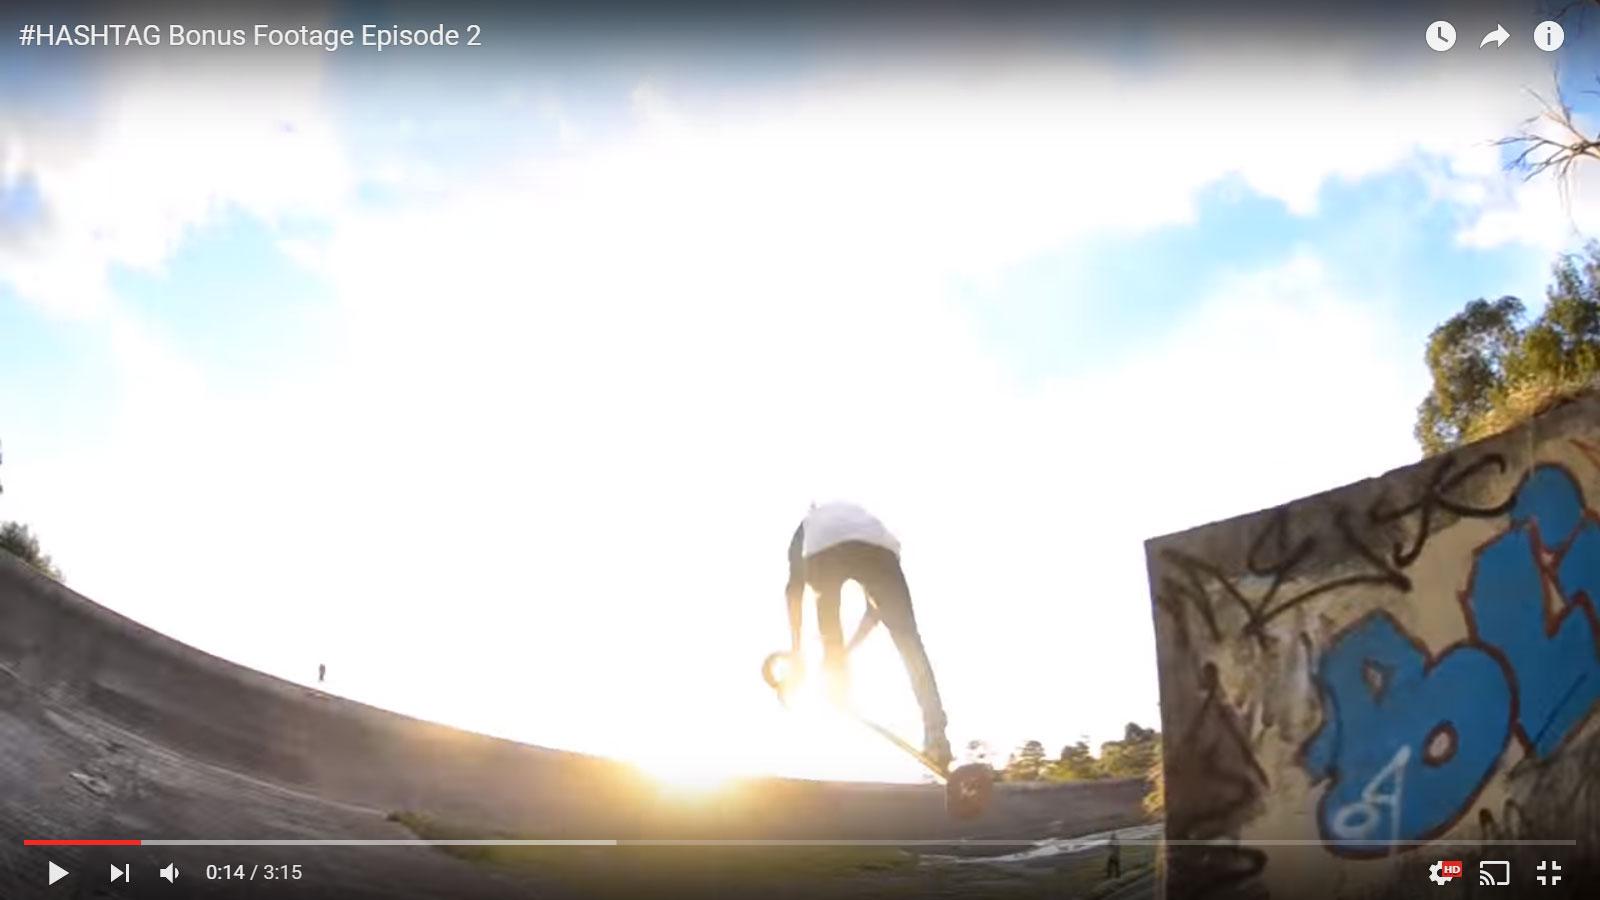 #HASHTAG Bonus Footage Episode 2